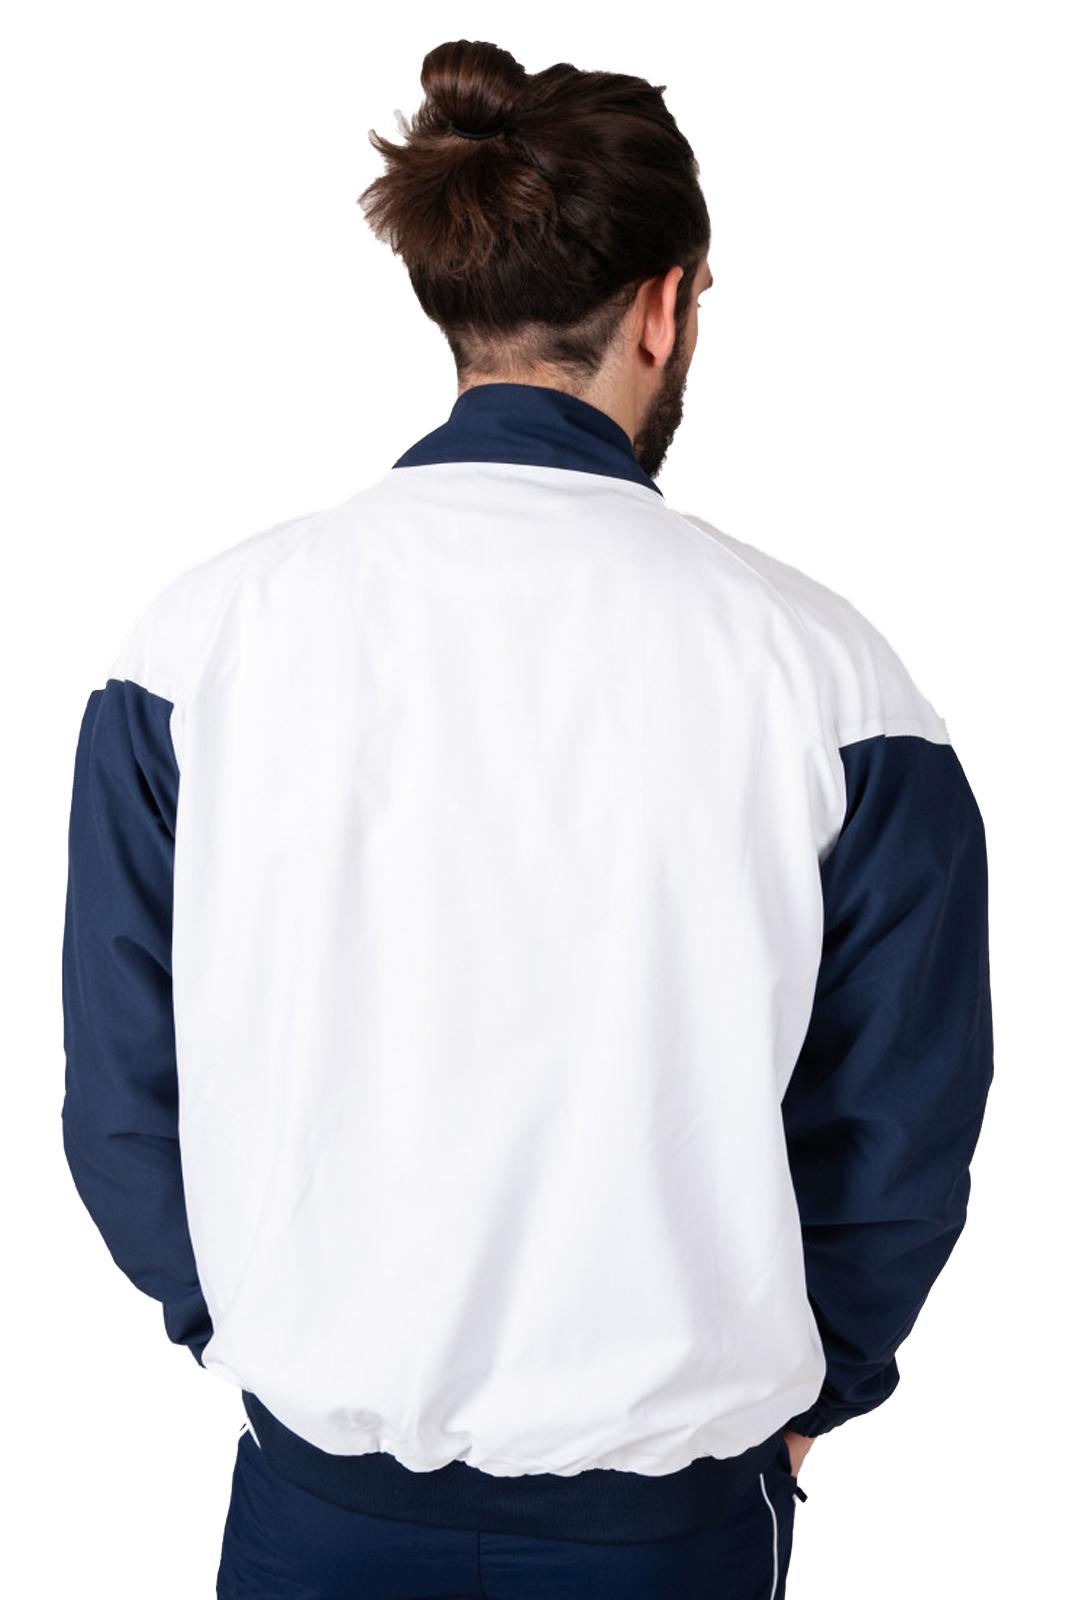 Vestes zippées  Fila 684487 1 WHITE